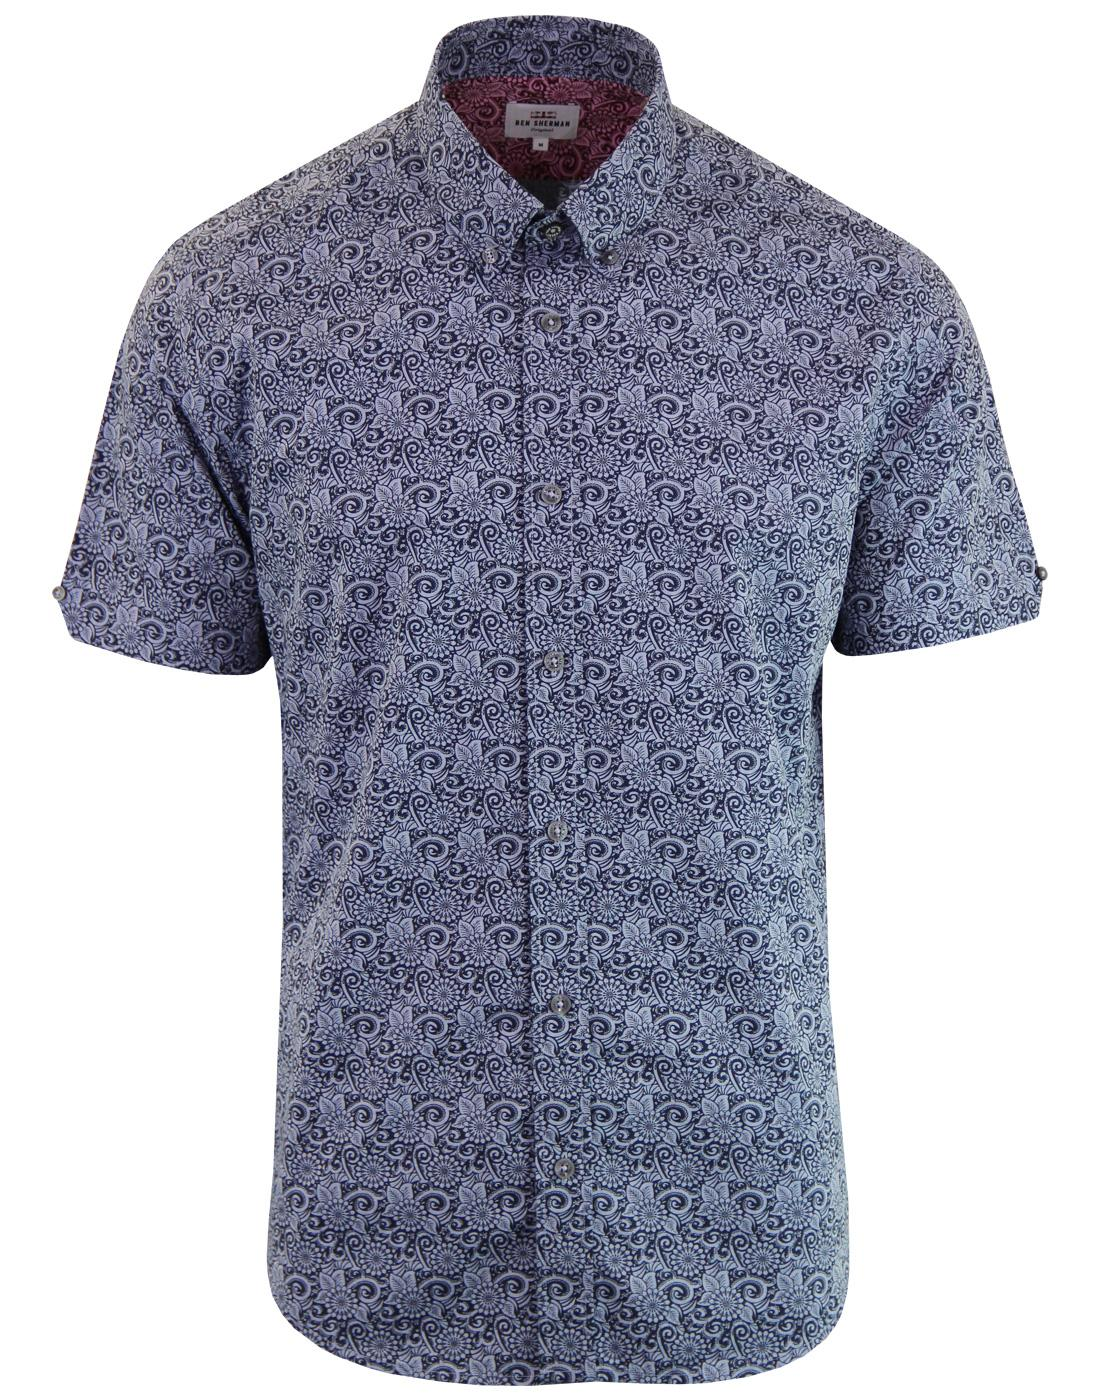 BEN SHERMAN Retro 60s Stencil Floral Shirt NAVY